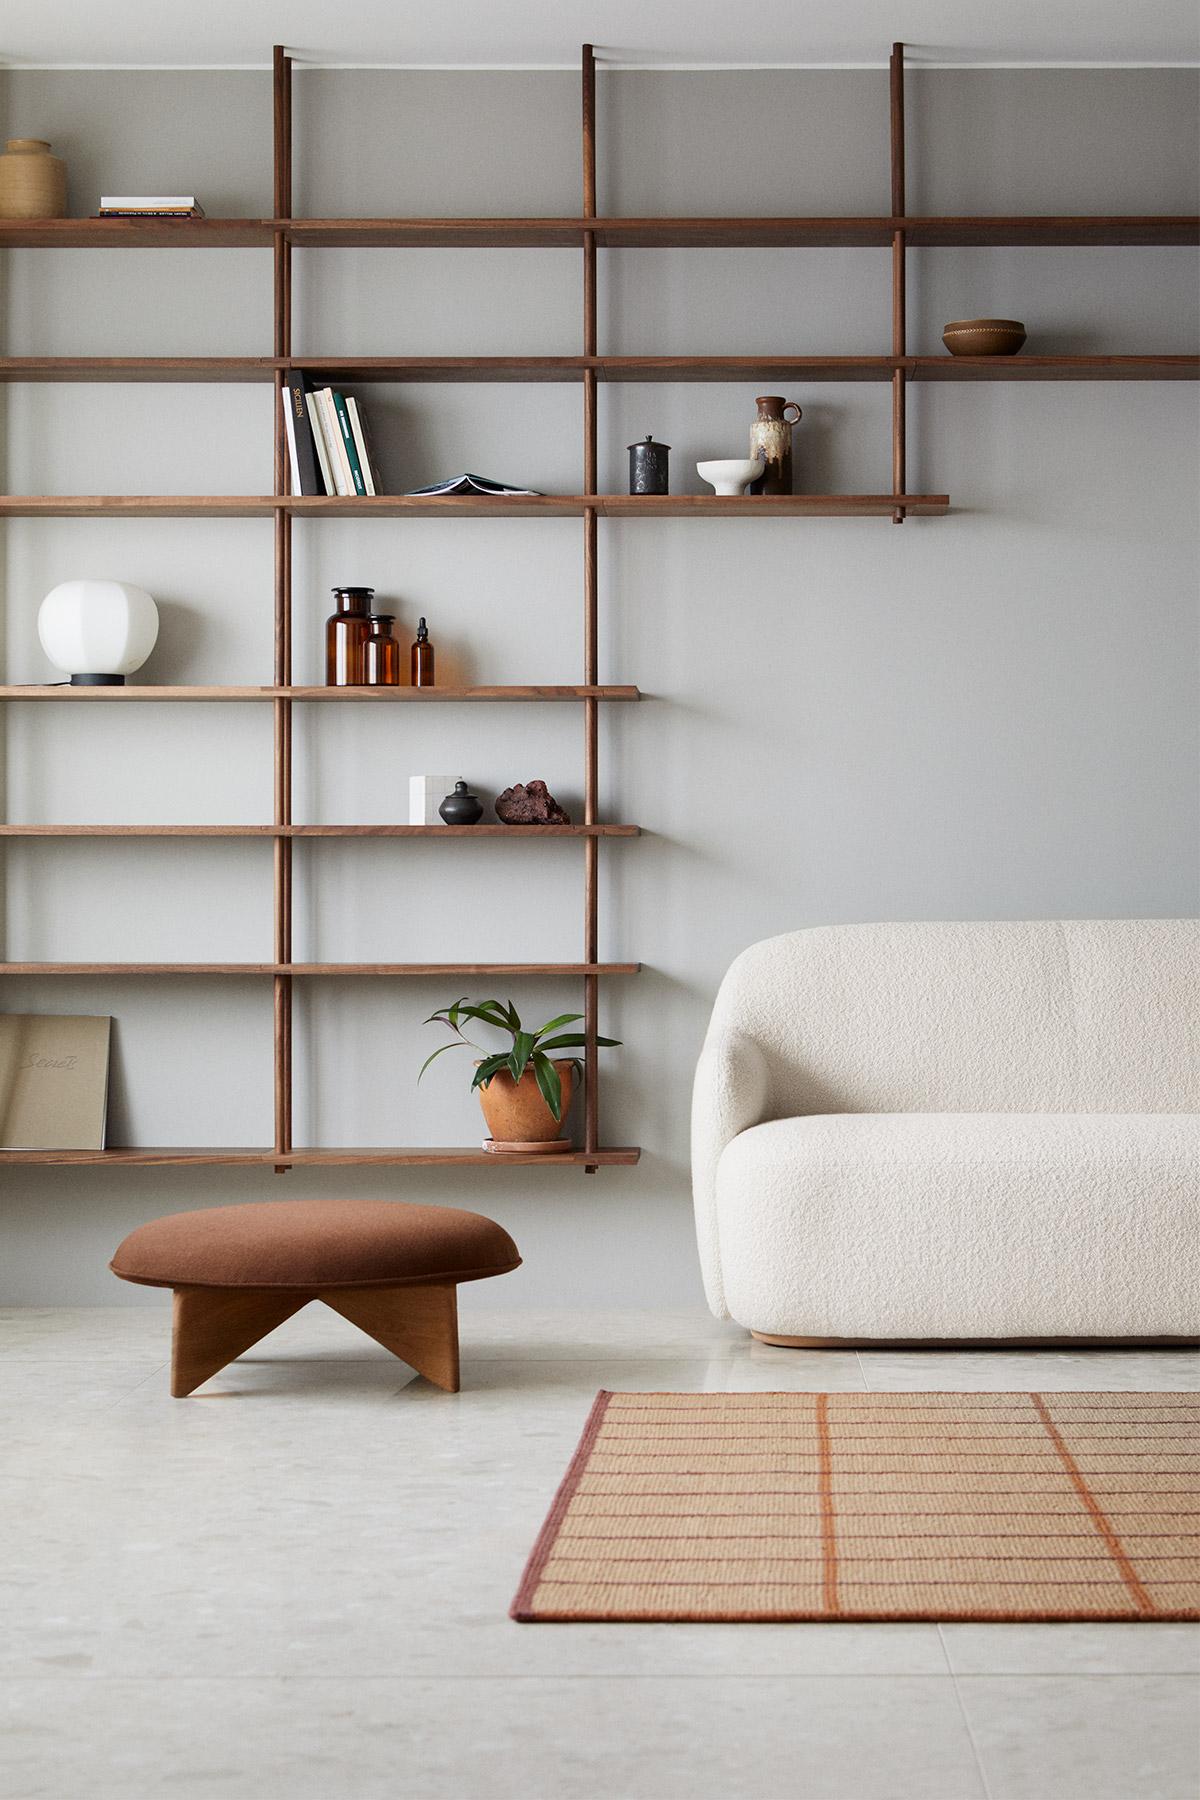 A calm Japanese interior with walnut wood shelving and cream sofa